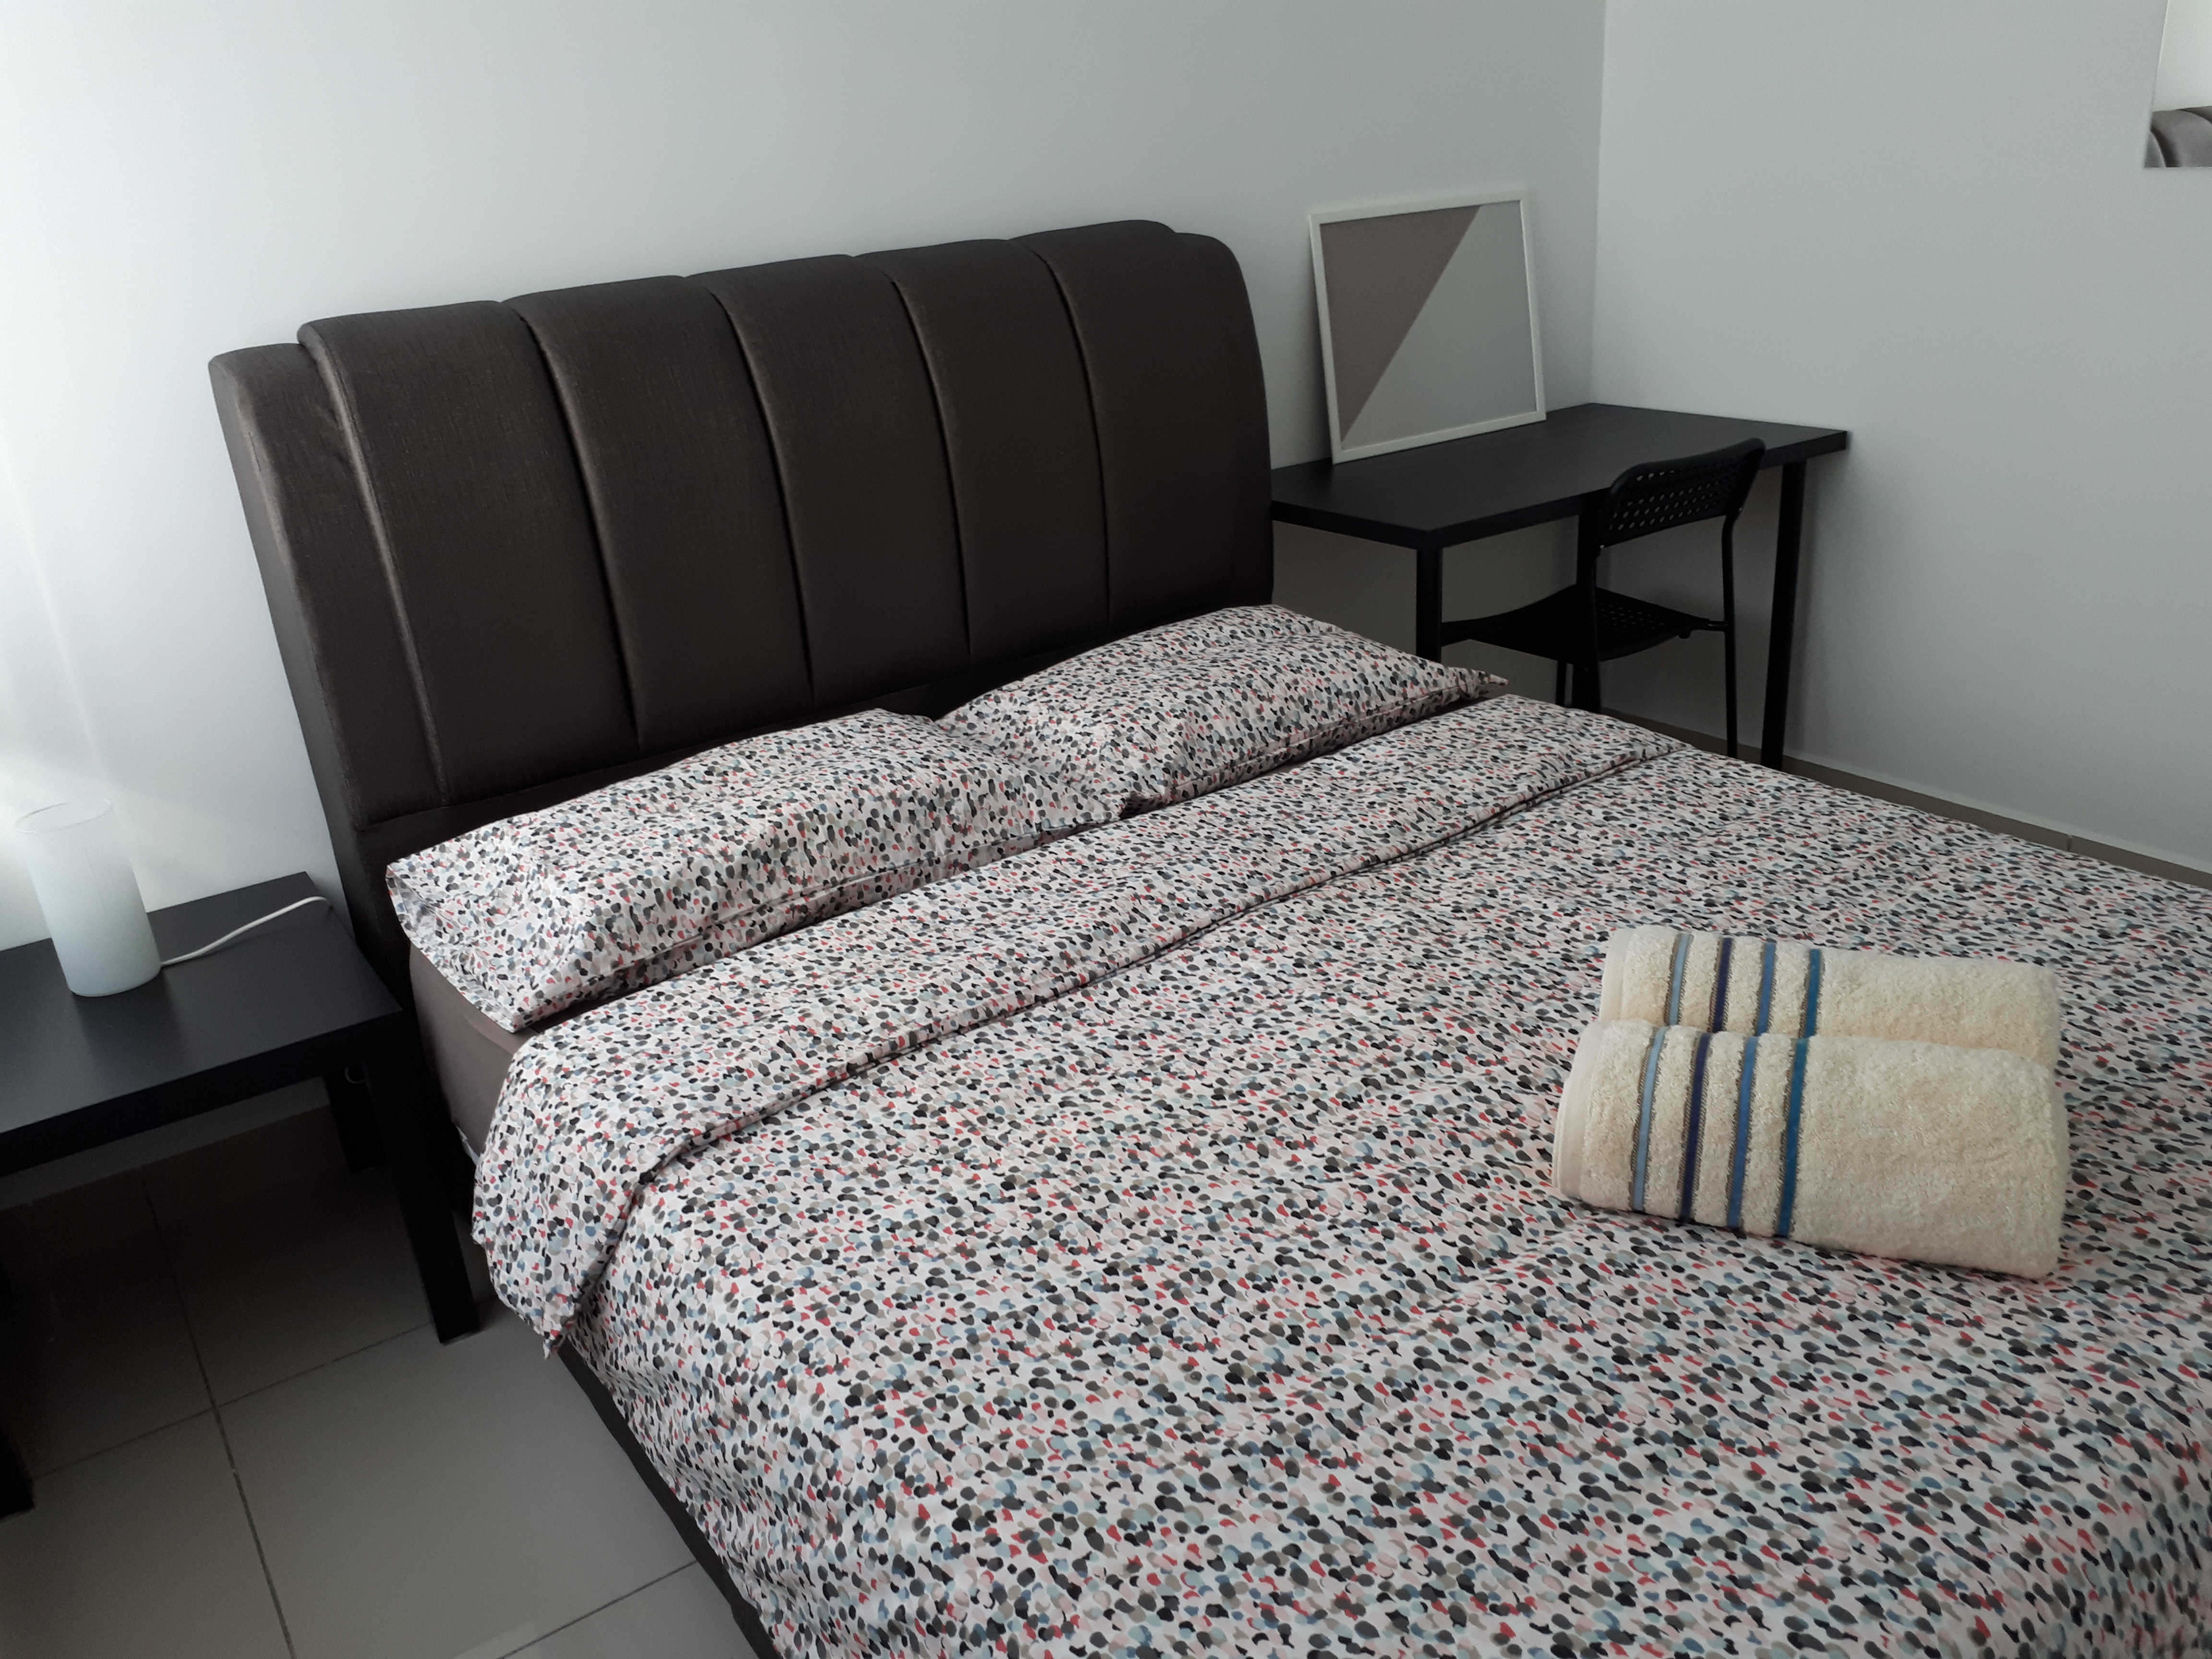 Dwiputra Private Residence @ Putrajaya (Homestay)